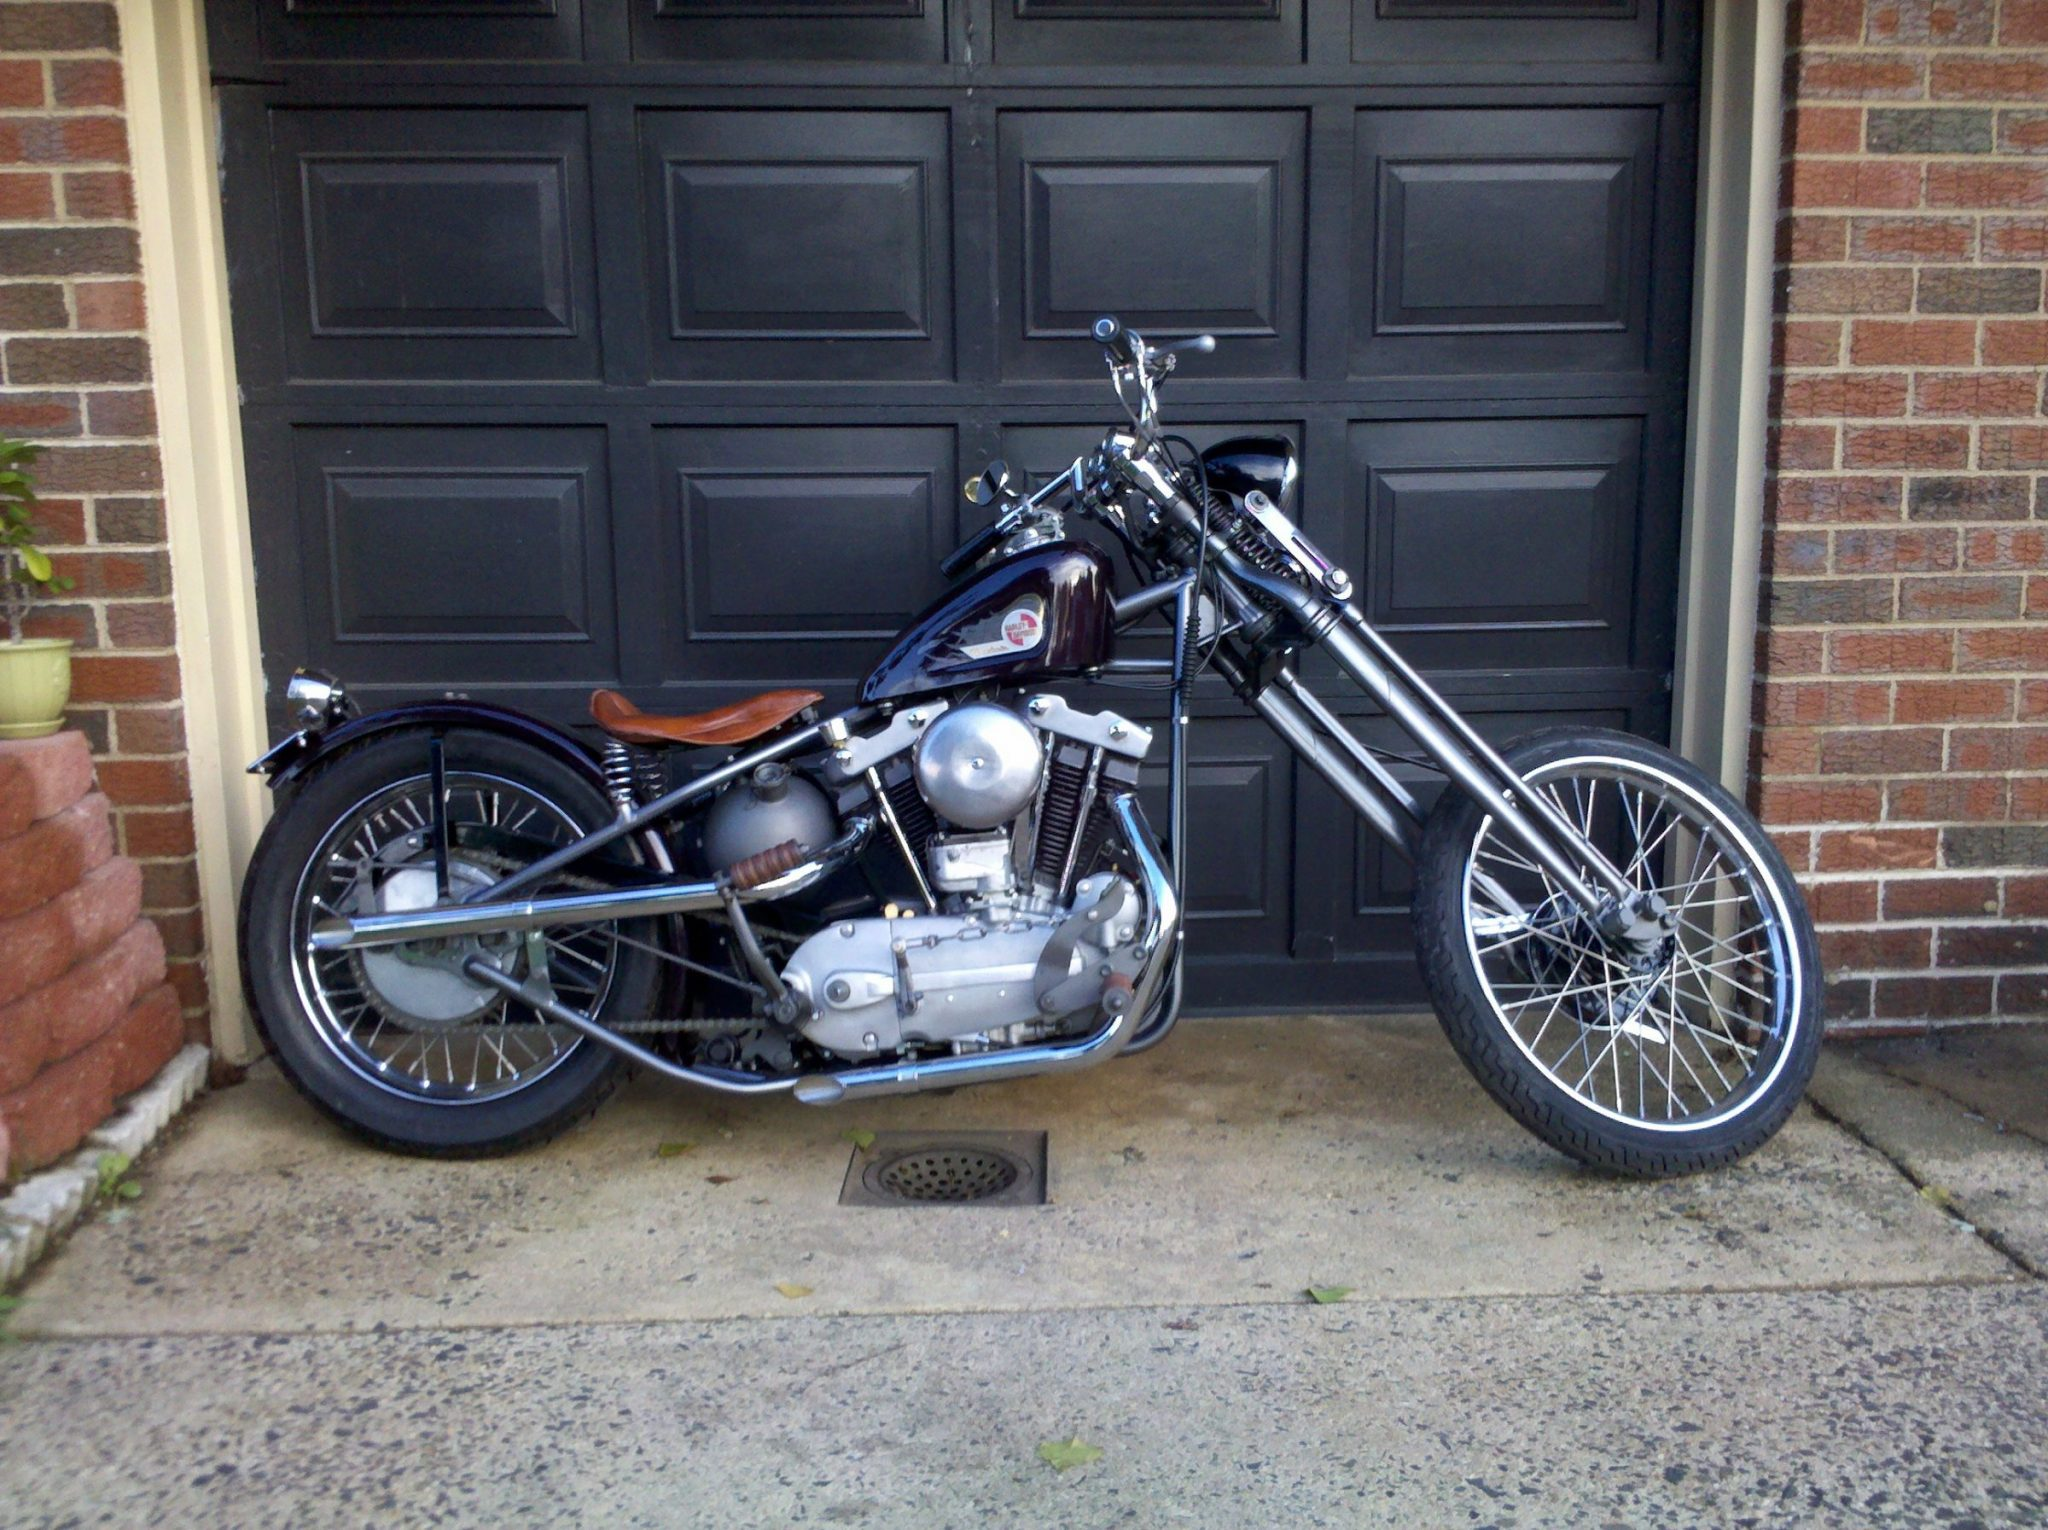 Lew's '57 Harley Davidson – Bonehead Performance